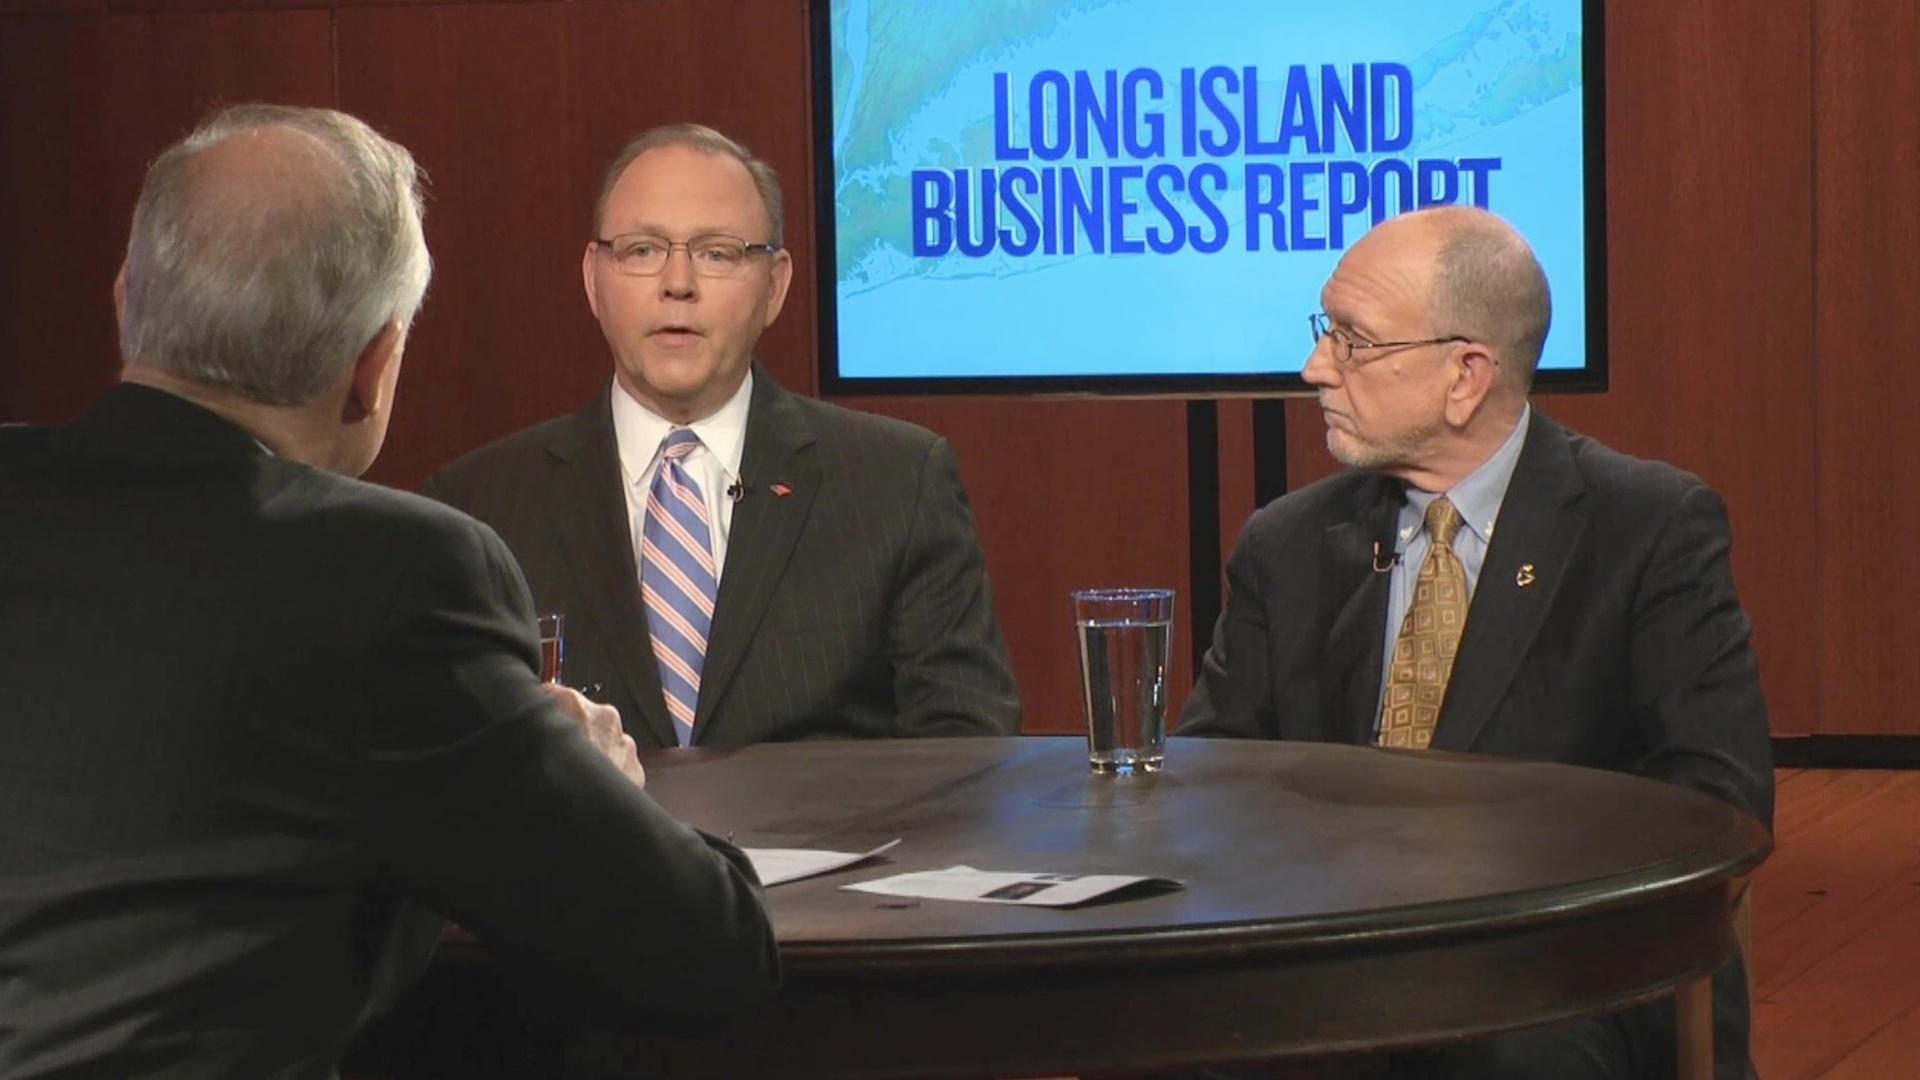 Long Island Business Report